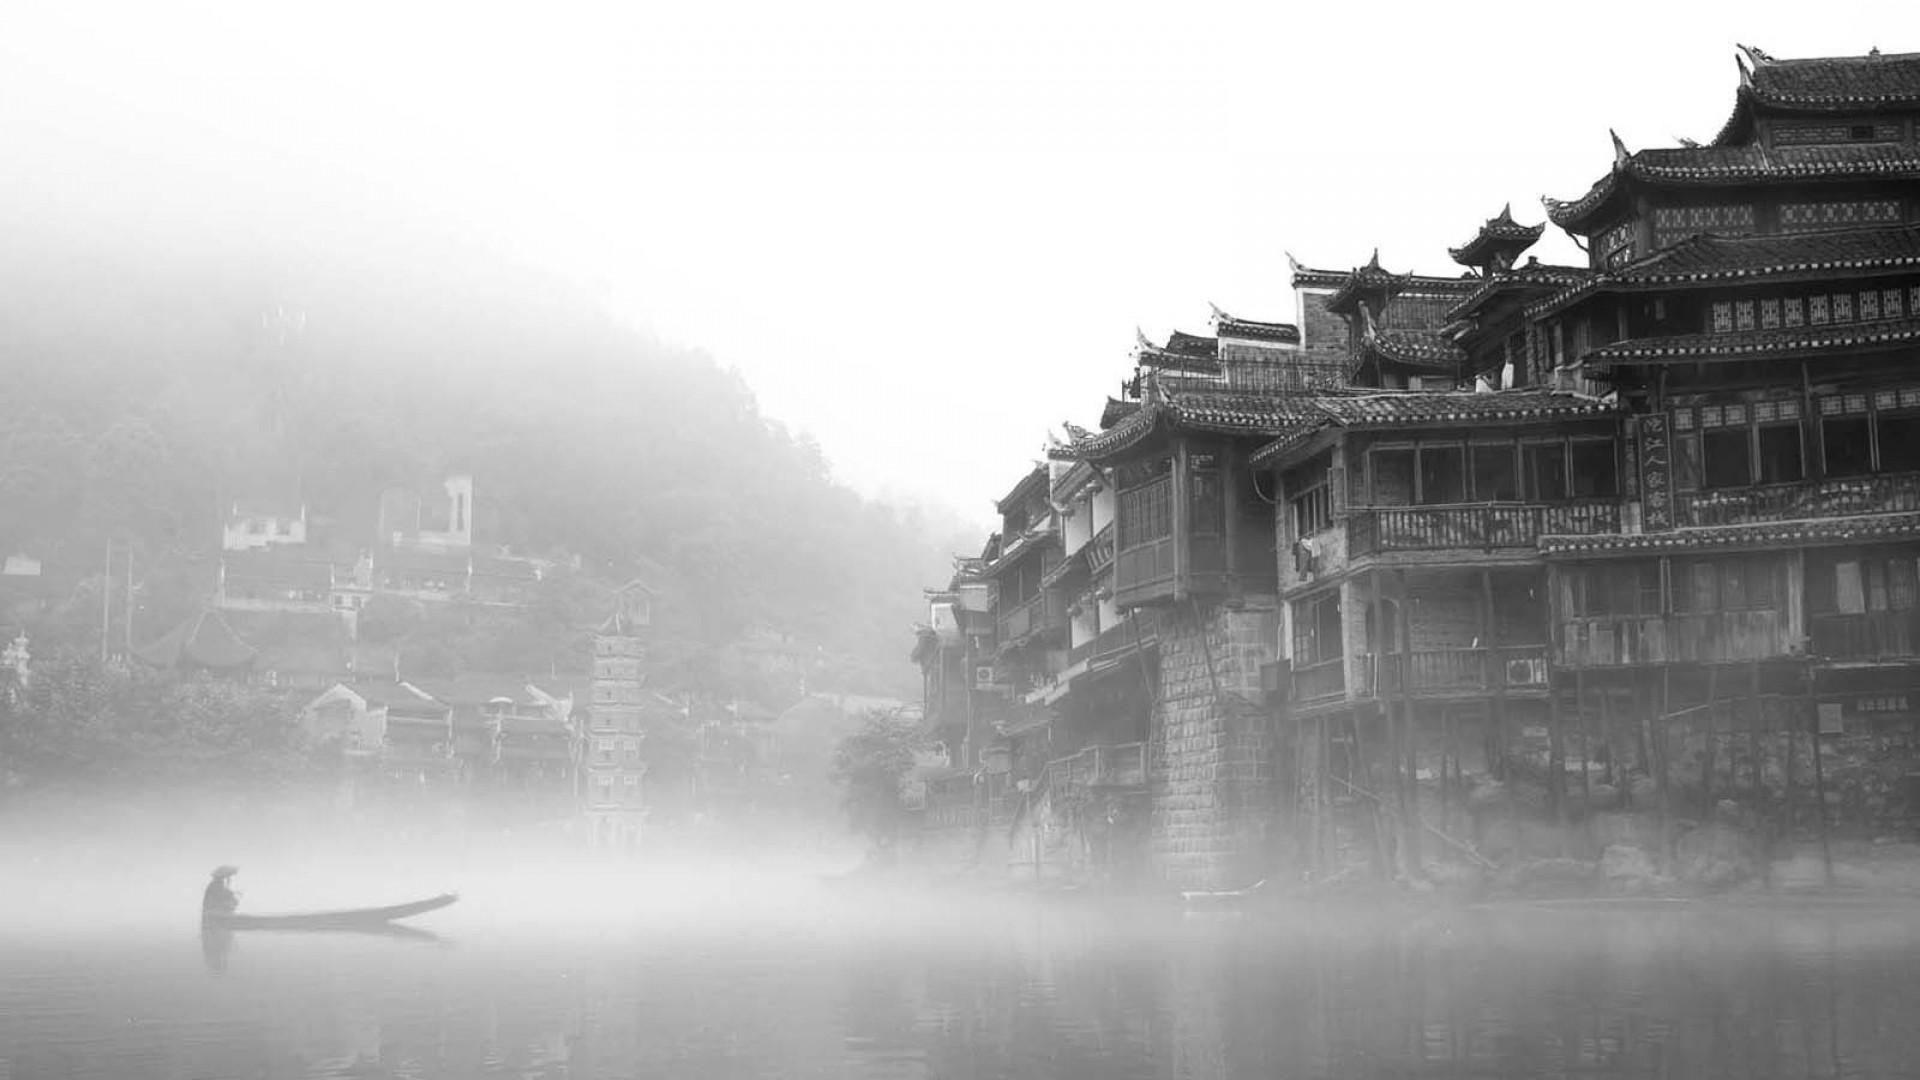 Ancient Chinese town `✿.¸¸.Ƹ✿Ʒ.¸¸. Chinese WallpaperWattpad